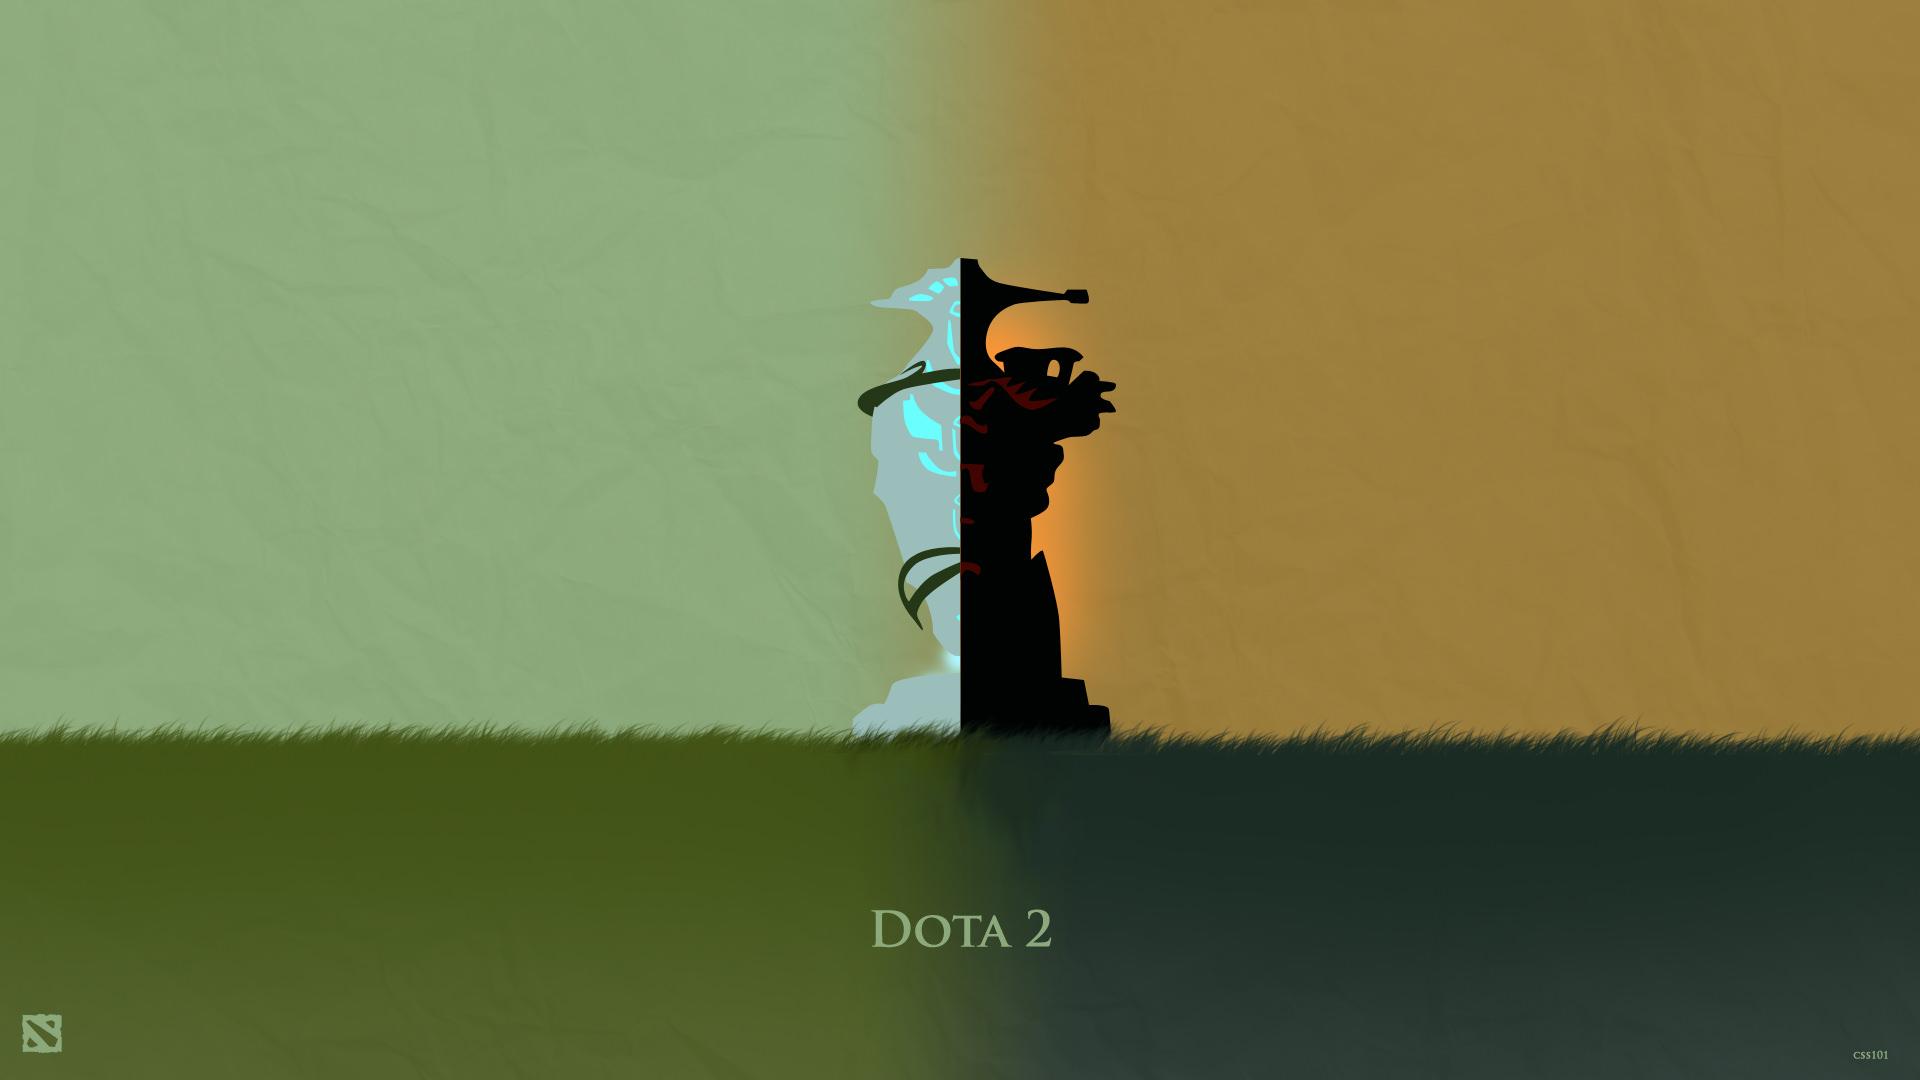 50 Beautiful Dota 2 Posters Amp Heroes Silhouette Hd Wallpapers